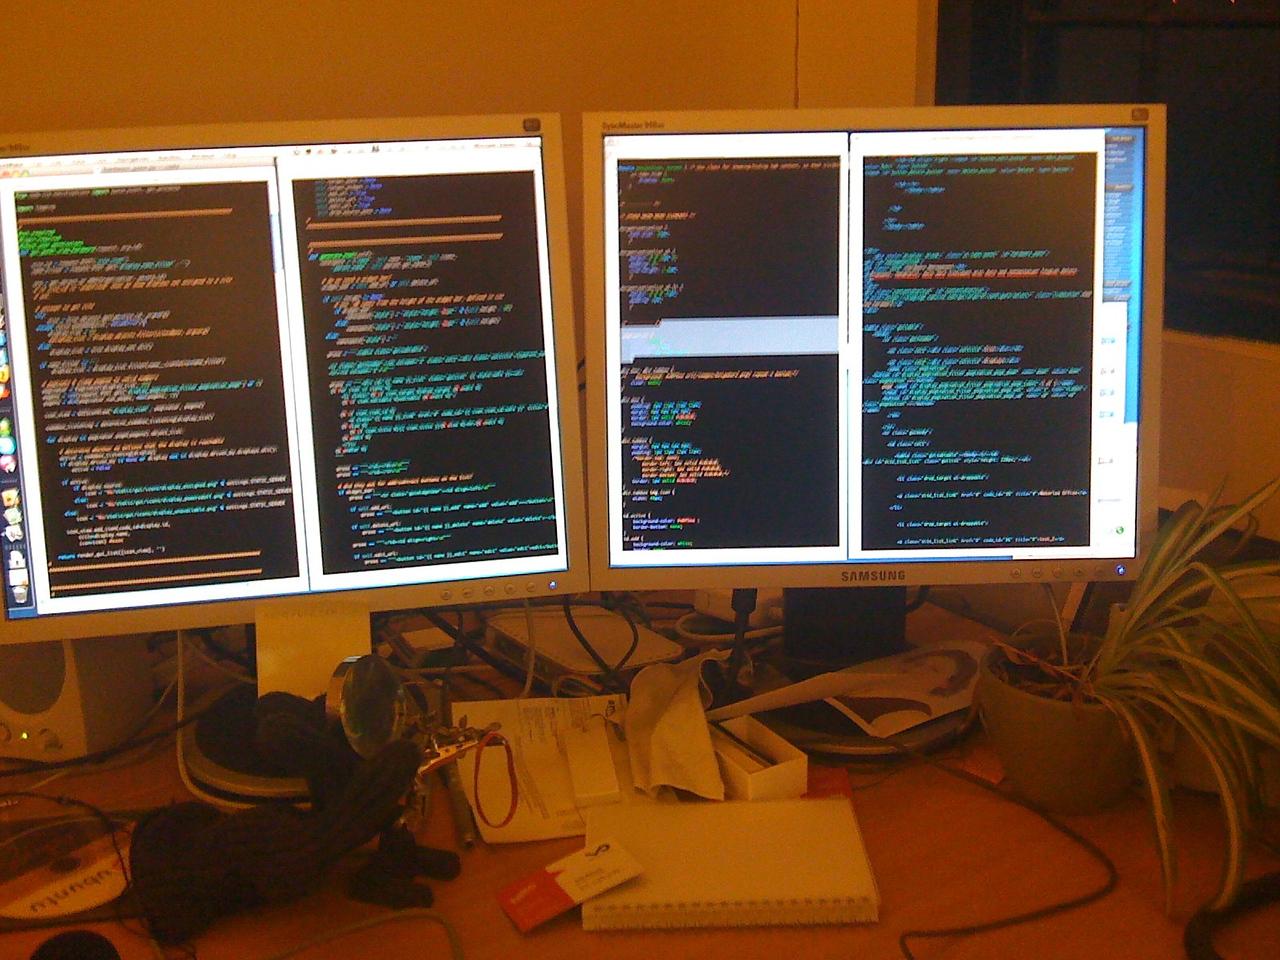 A sea of code